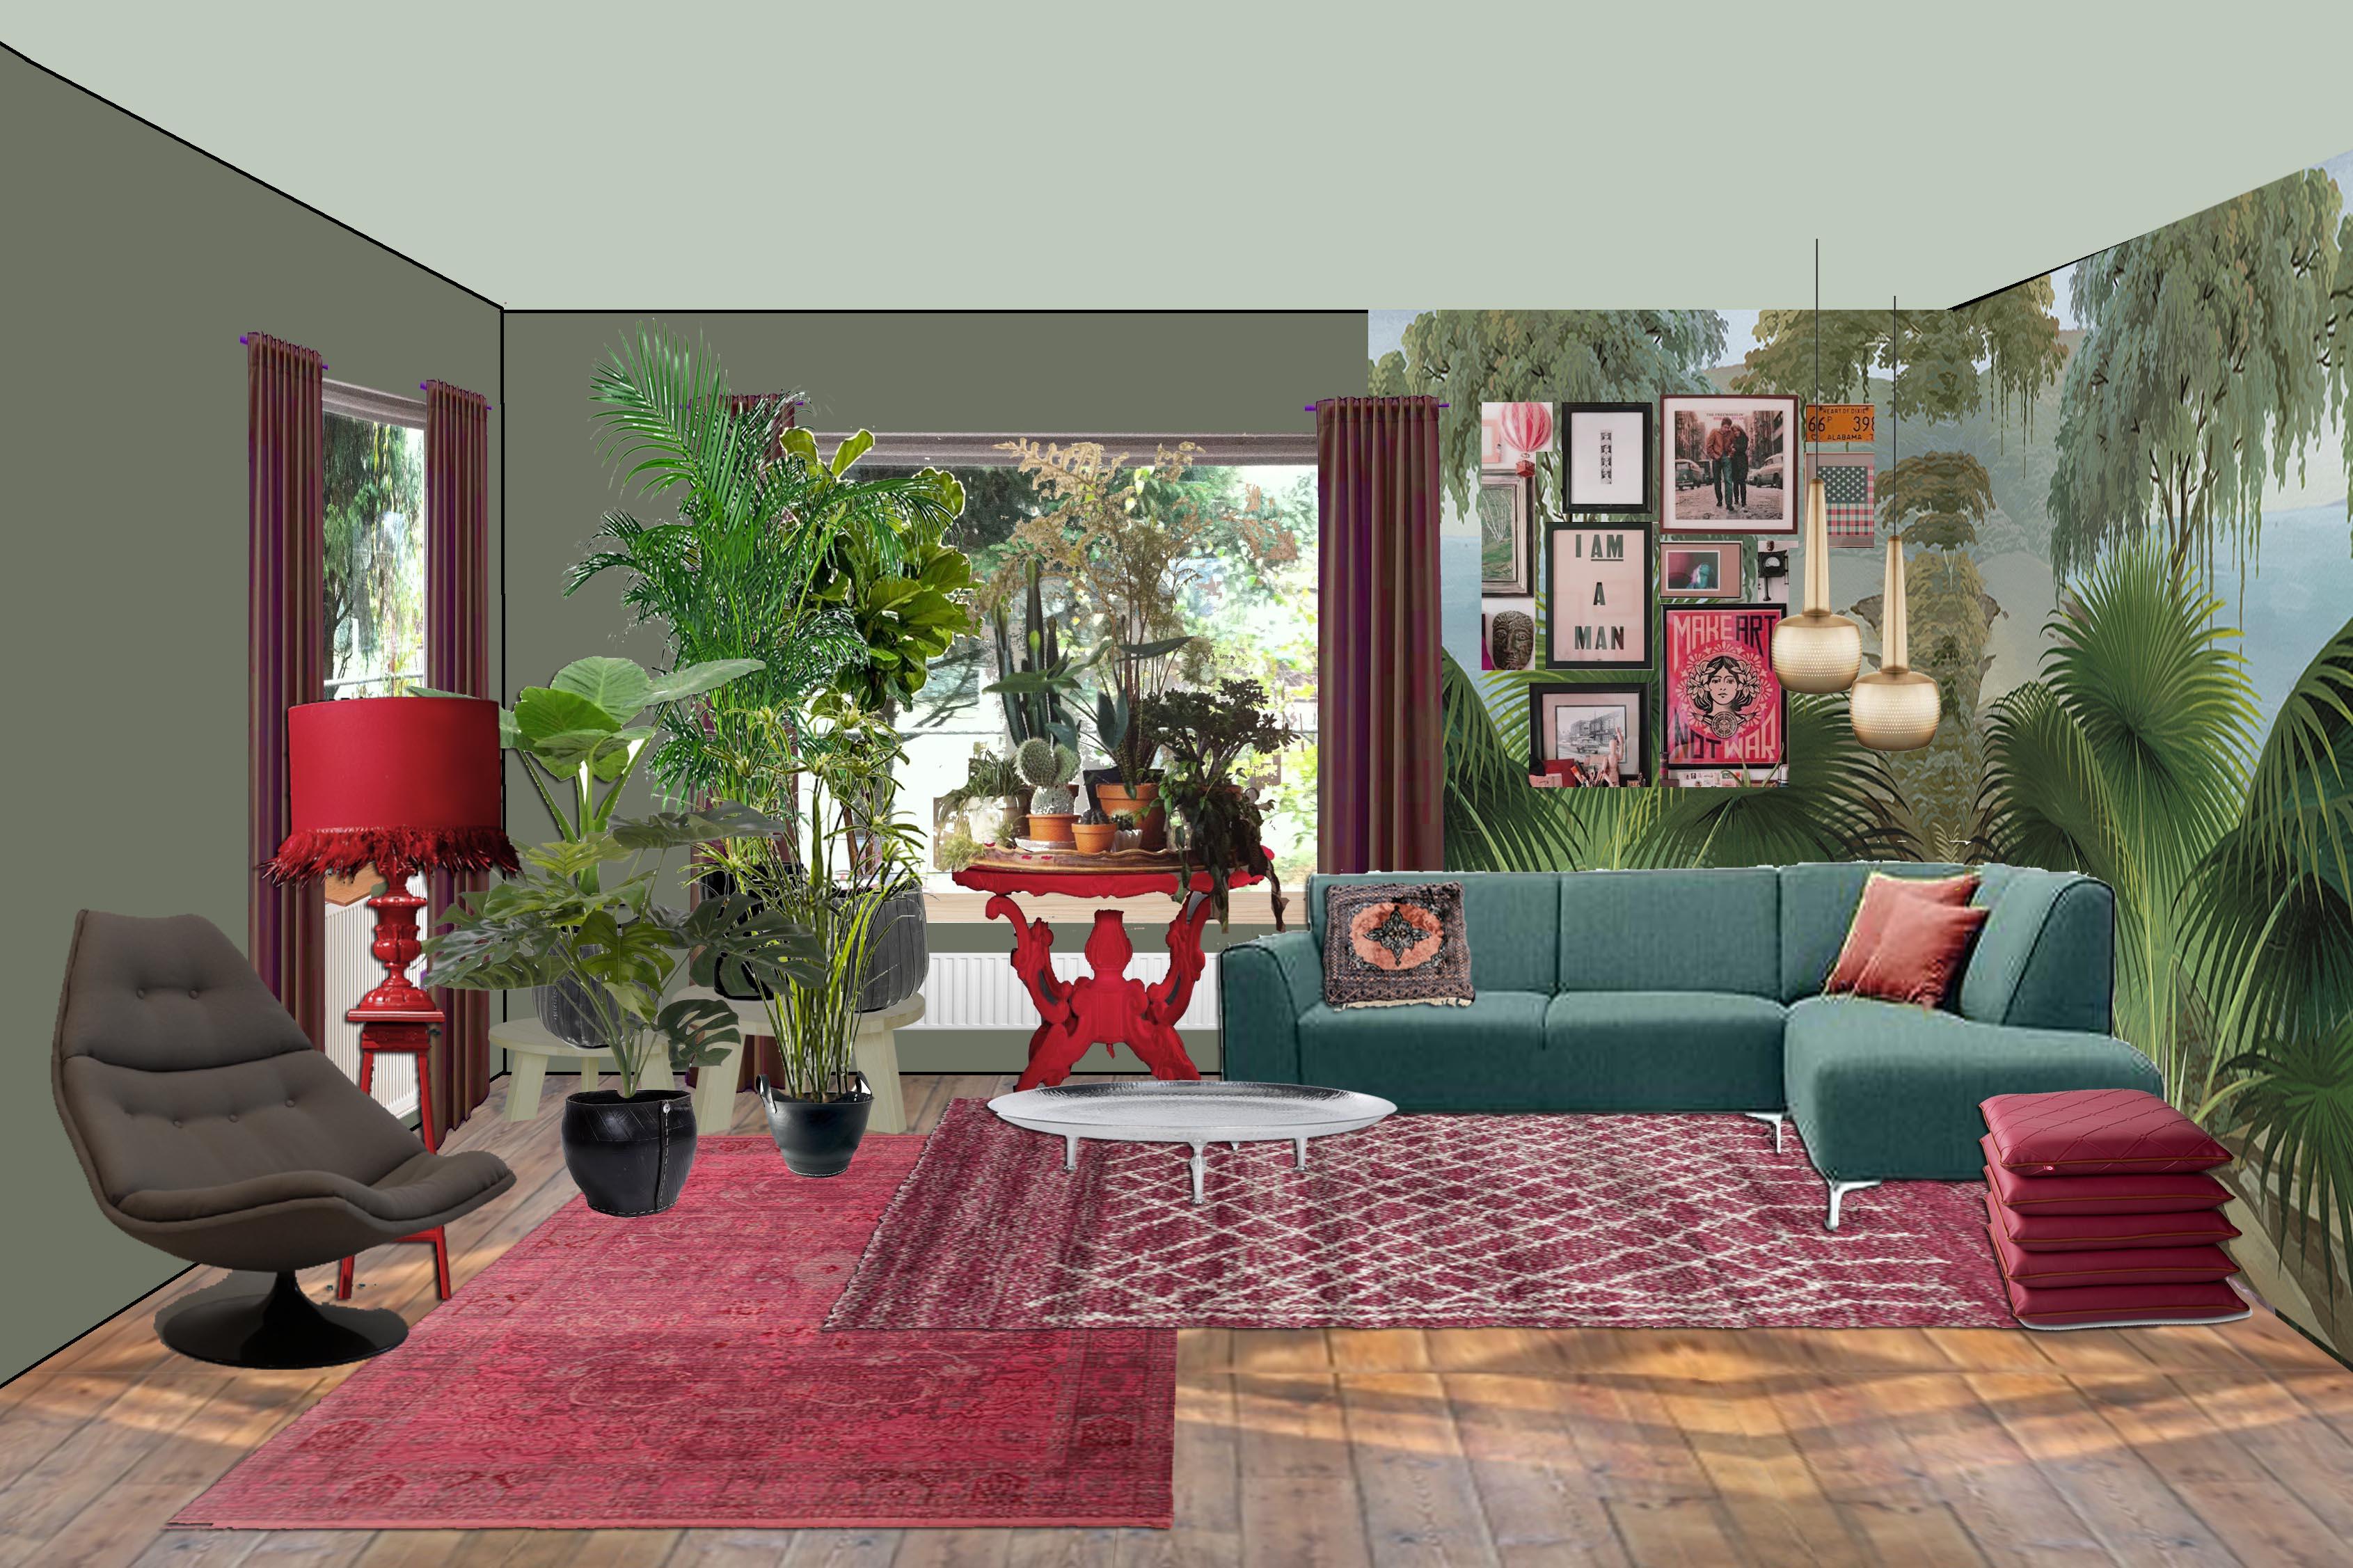 Interieur met zachte kleuren best images about interieur for Interieur kleuren woonkamer